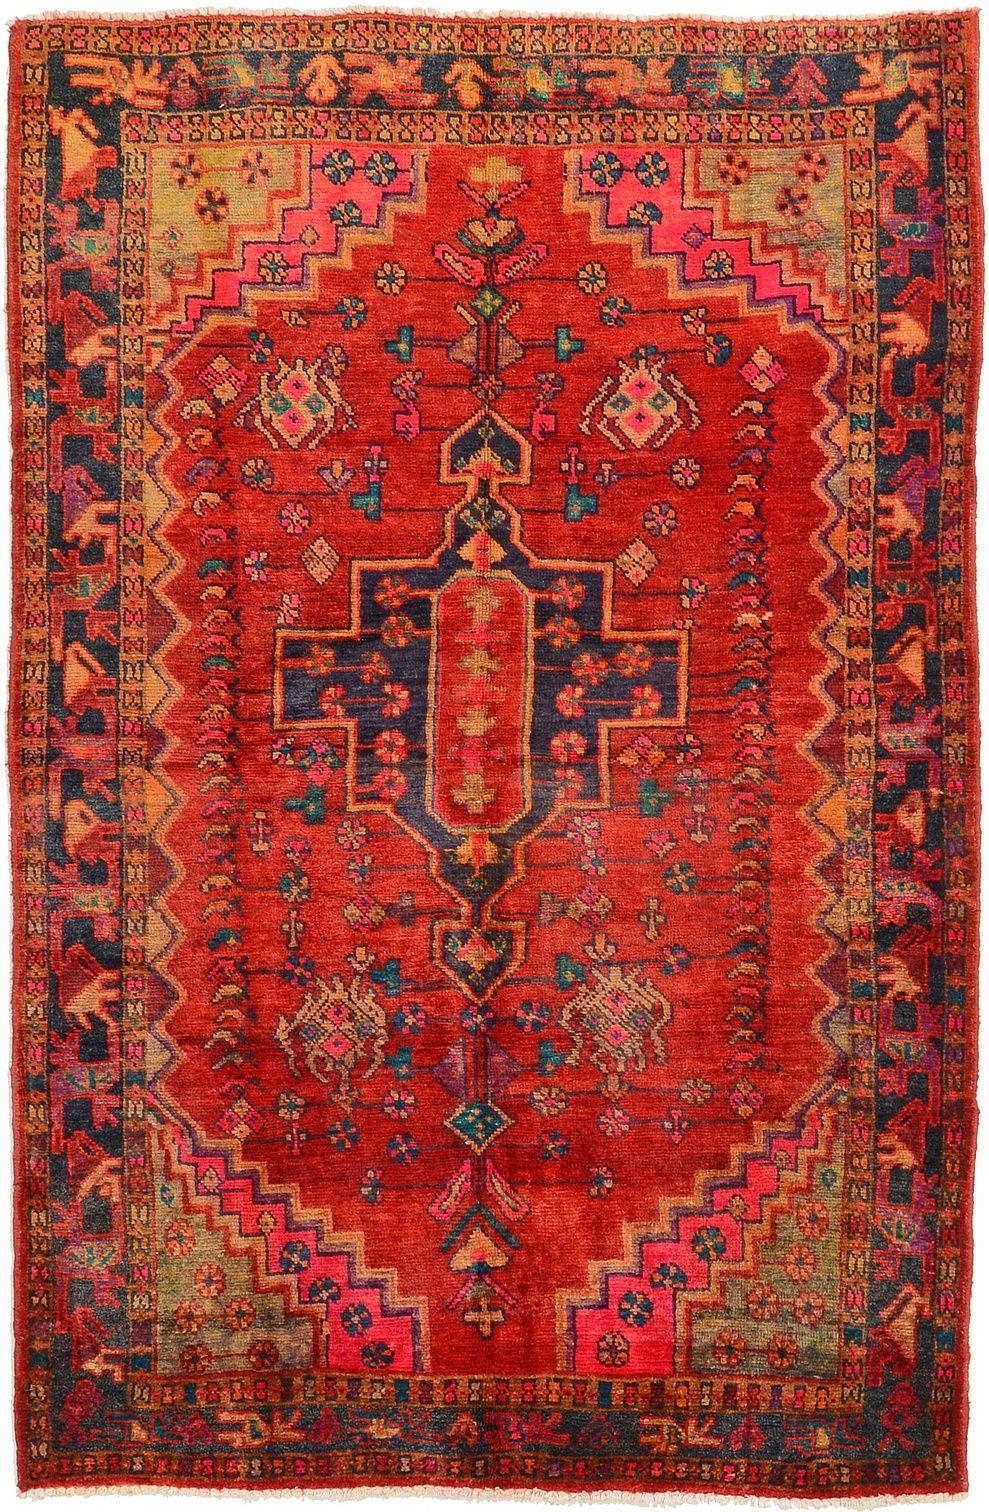 Red 5 1 X 7 9 Hamedan Rug Persian Rugs Esalerugs